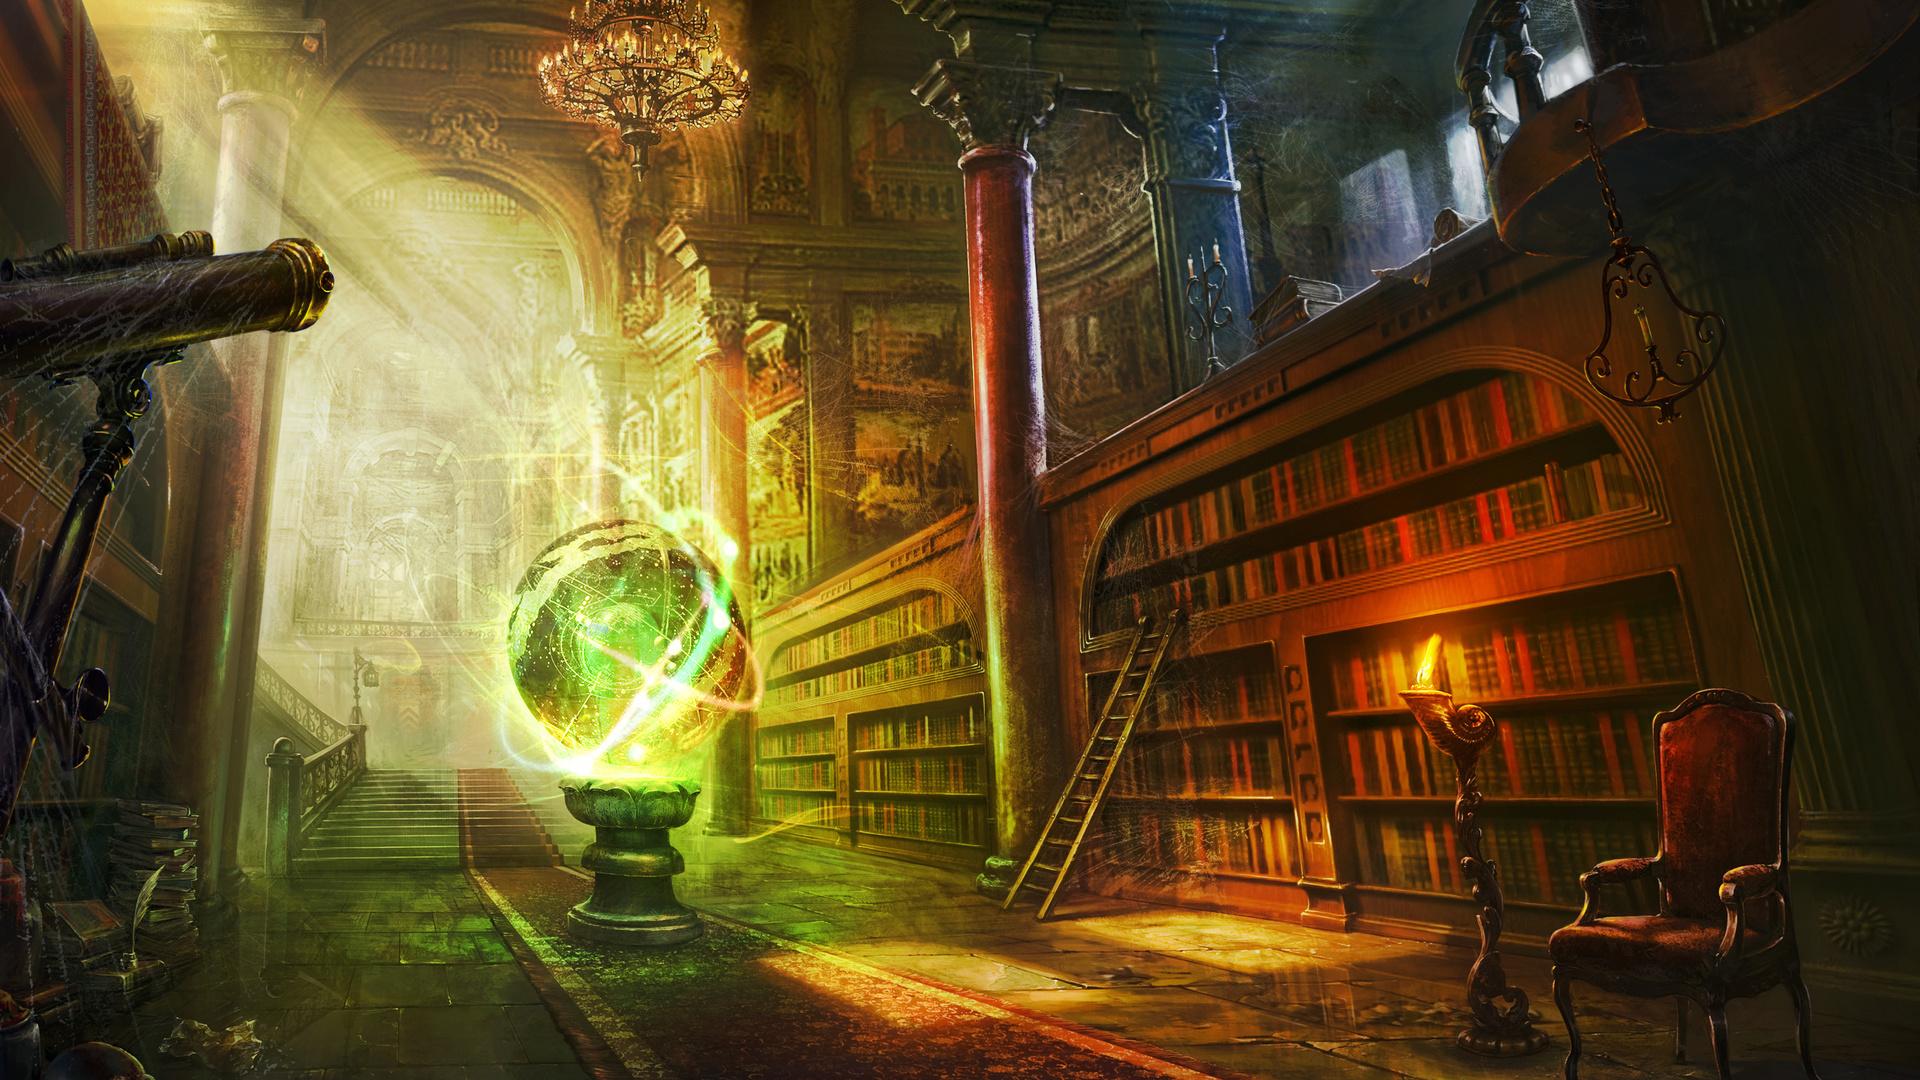 хочу, картинка академия волшебников регулярного